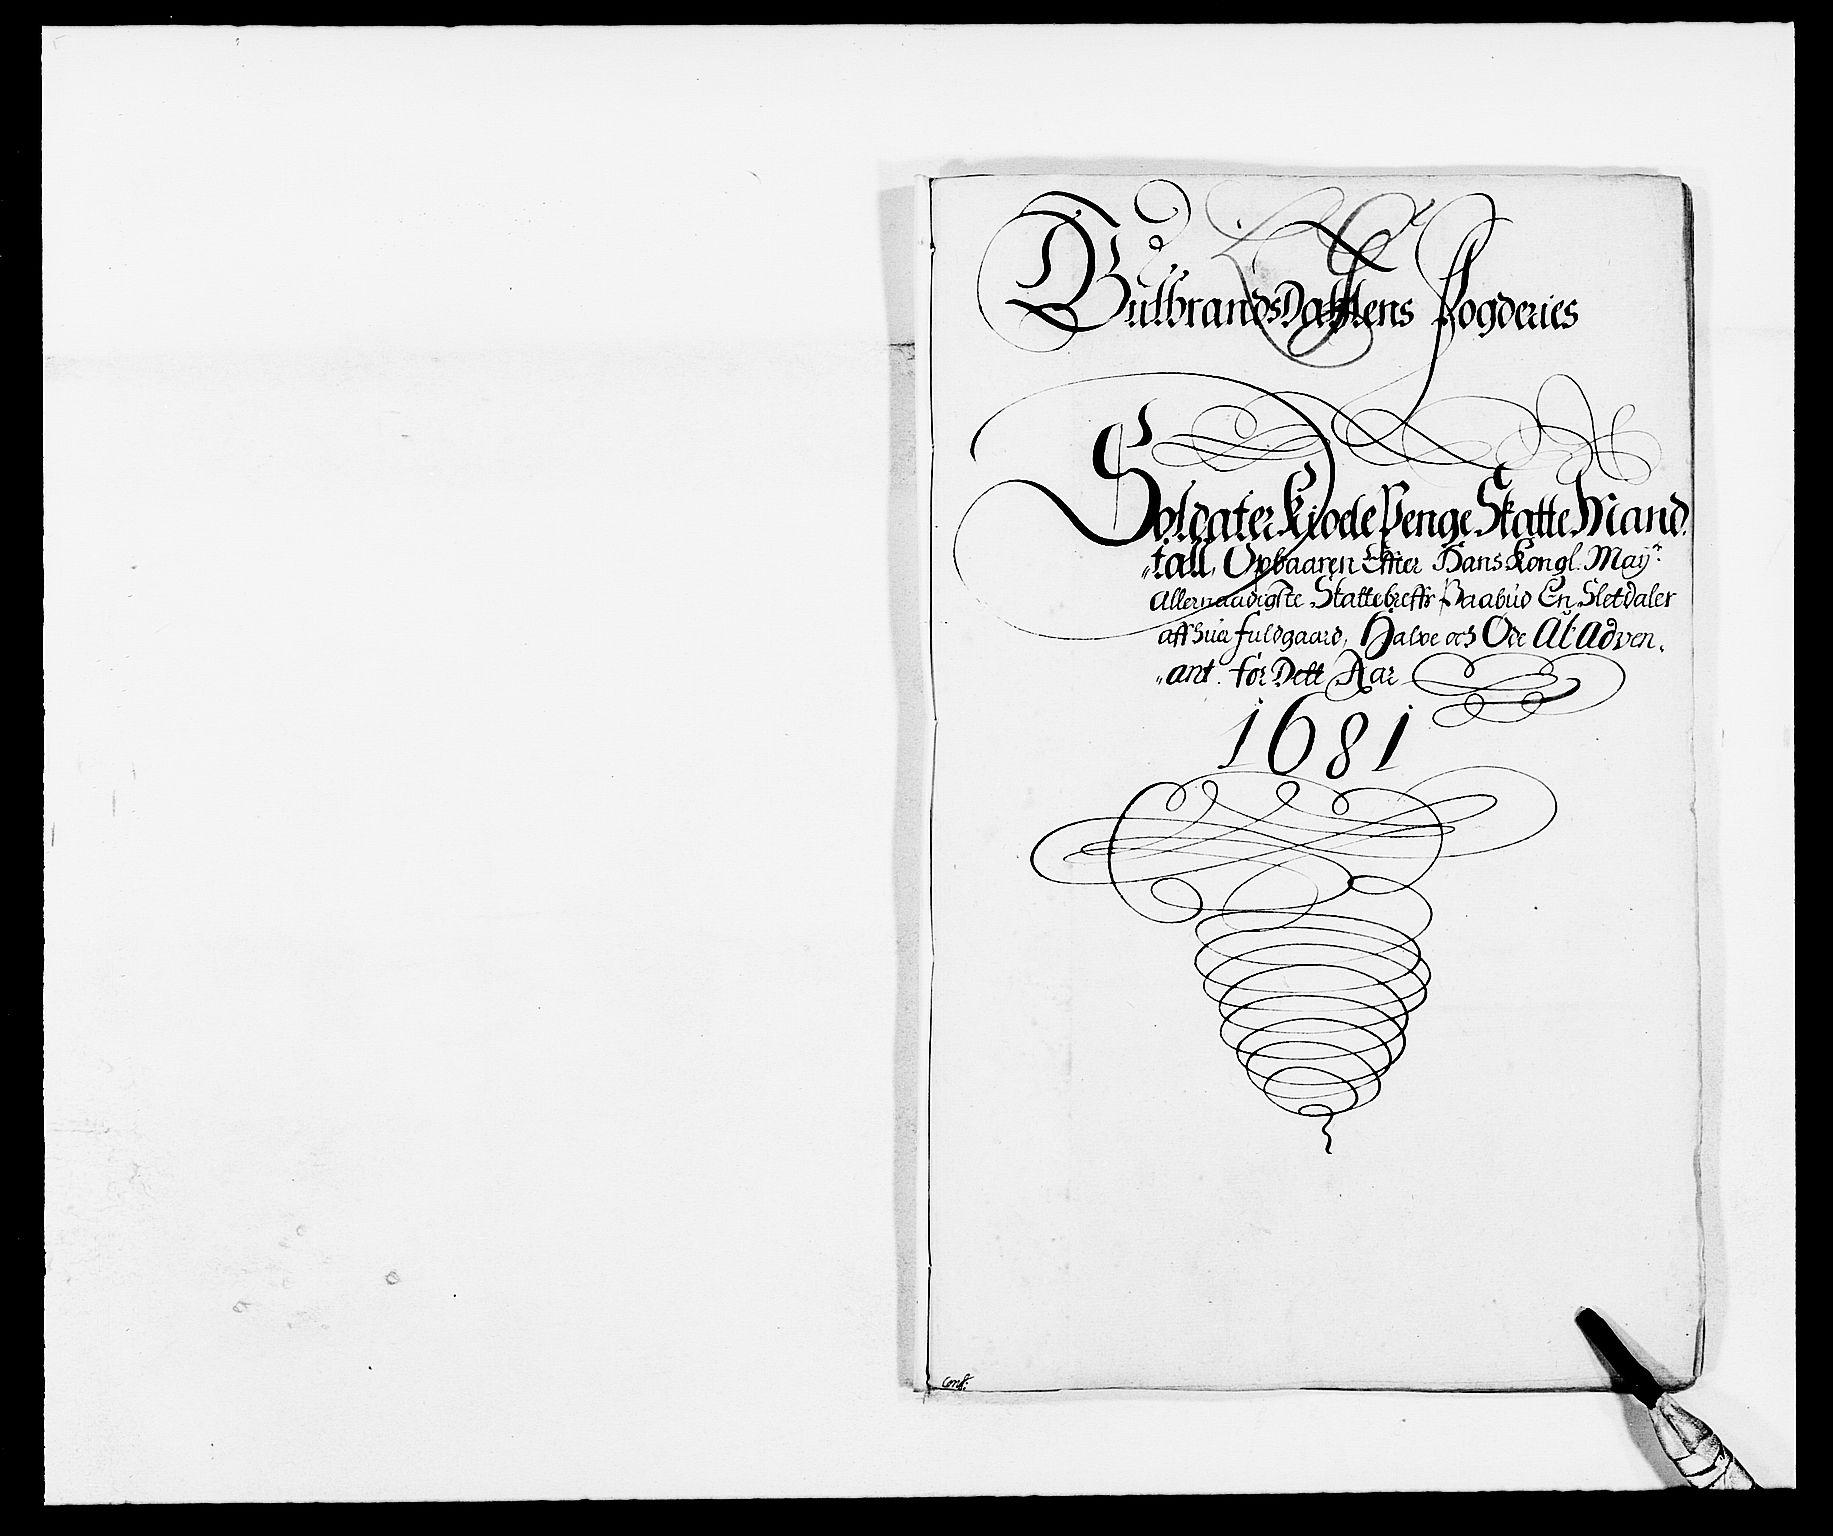 RA, Rentekammeret inntil 1814, Reviderte regnskaper, Fogderegnskap, R17/L1156: Fogderegnskap Gudbrandsdal, 1681, s. 95